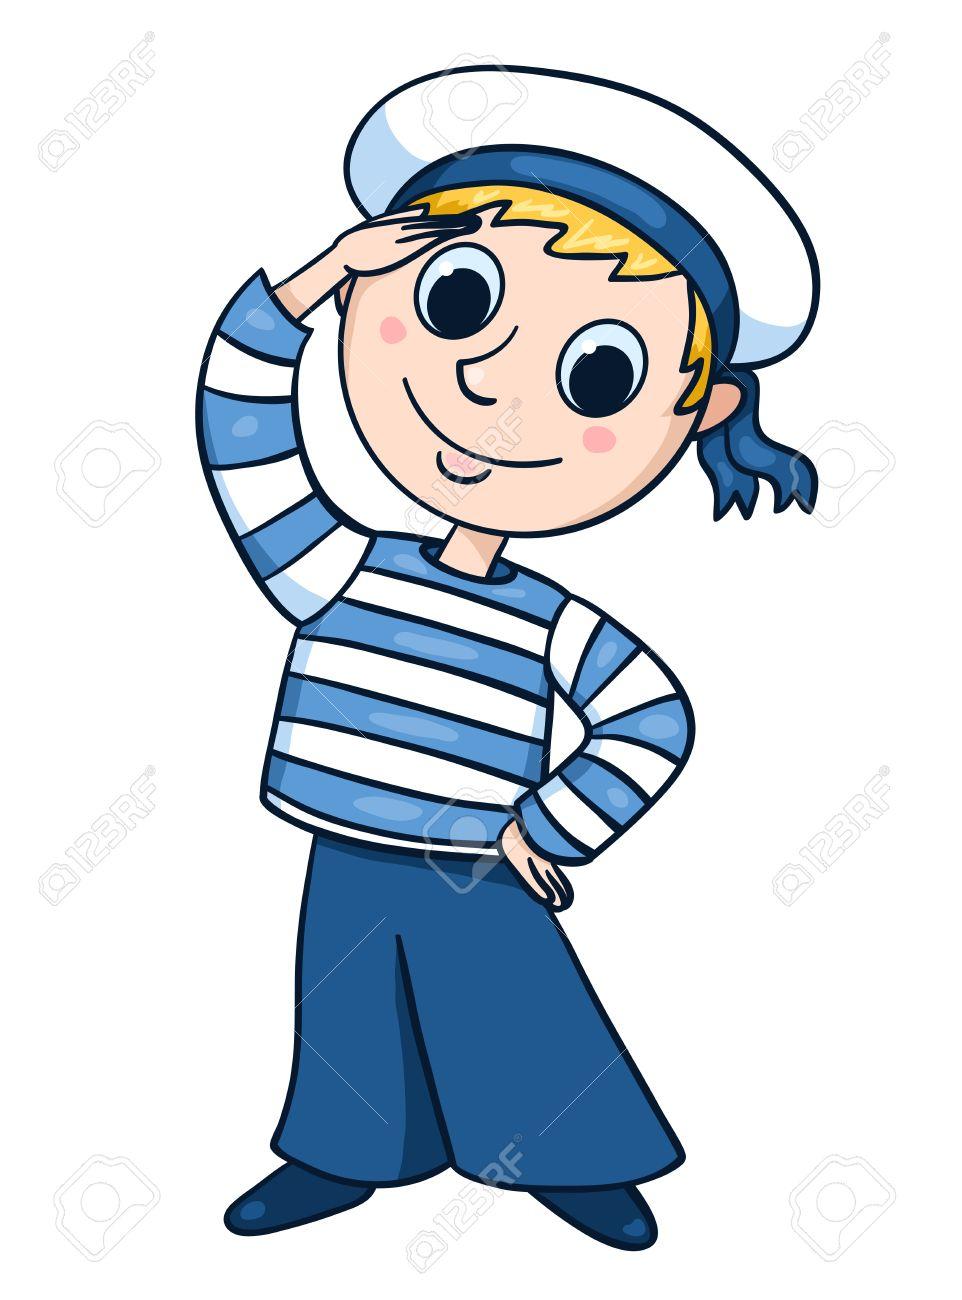 Sailor Clipart Free.